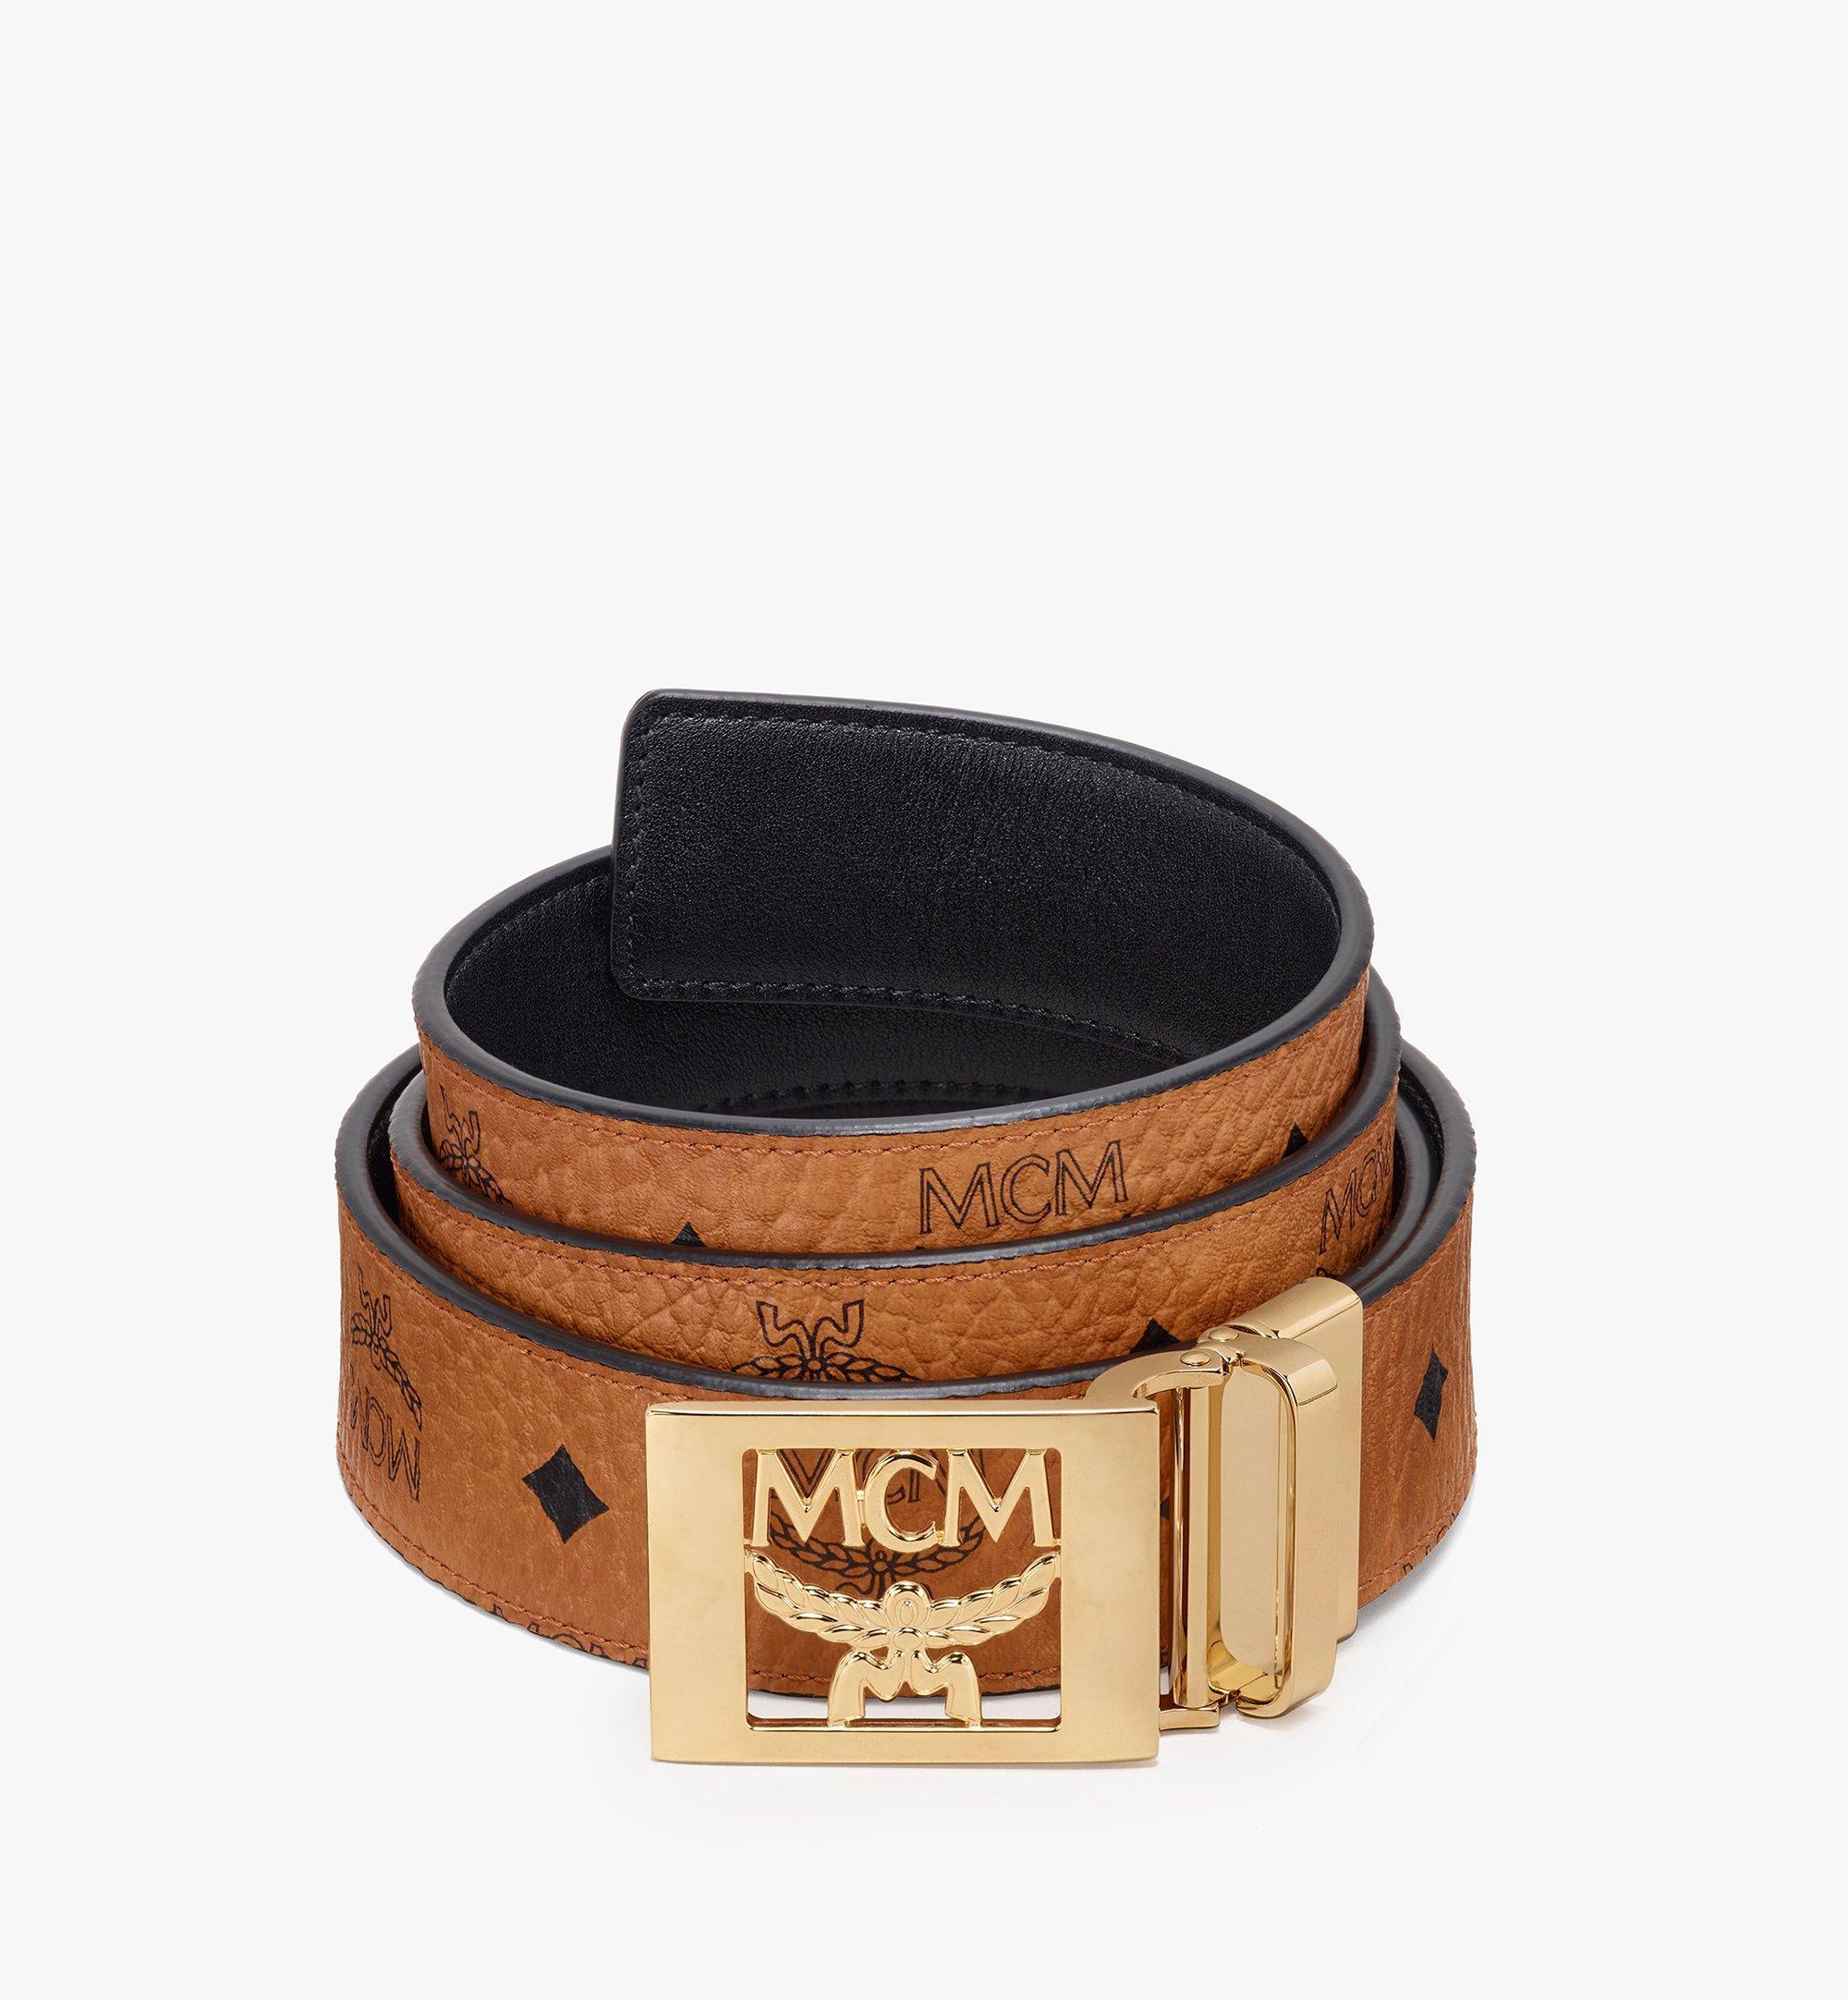 MCM Visetos皮革 MCM 可翻轉皮帶 Cognac MYB9AMM36CO001 更多視圖 1